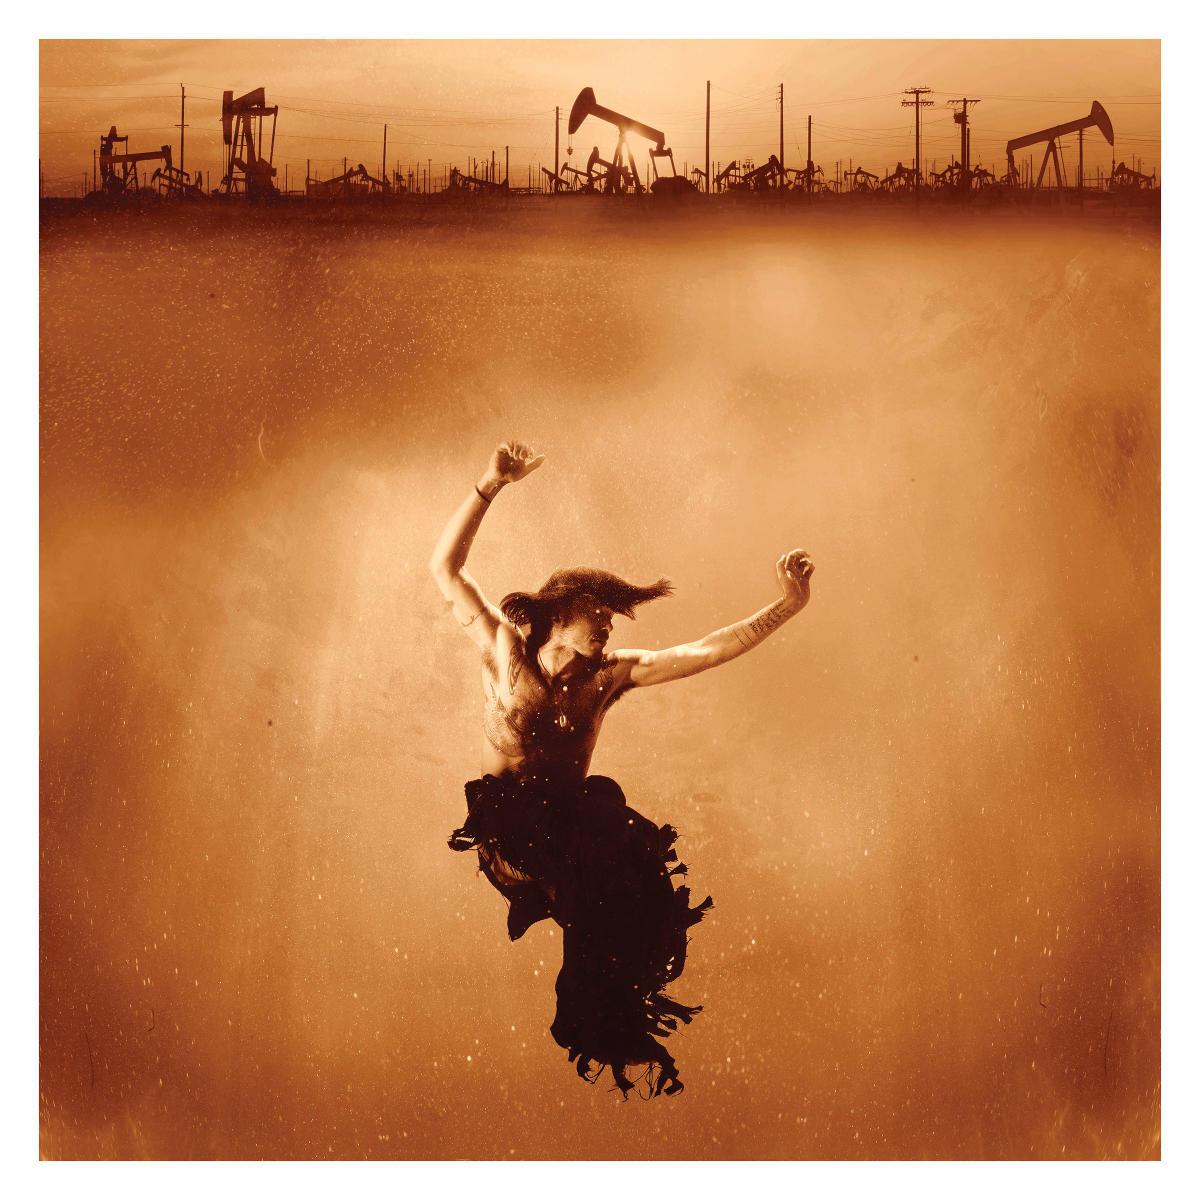 Oil Boom by Cara Romero